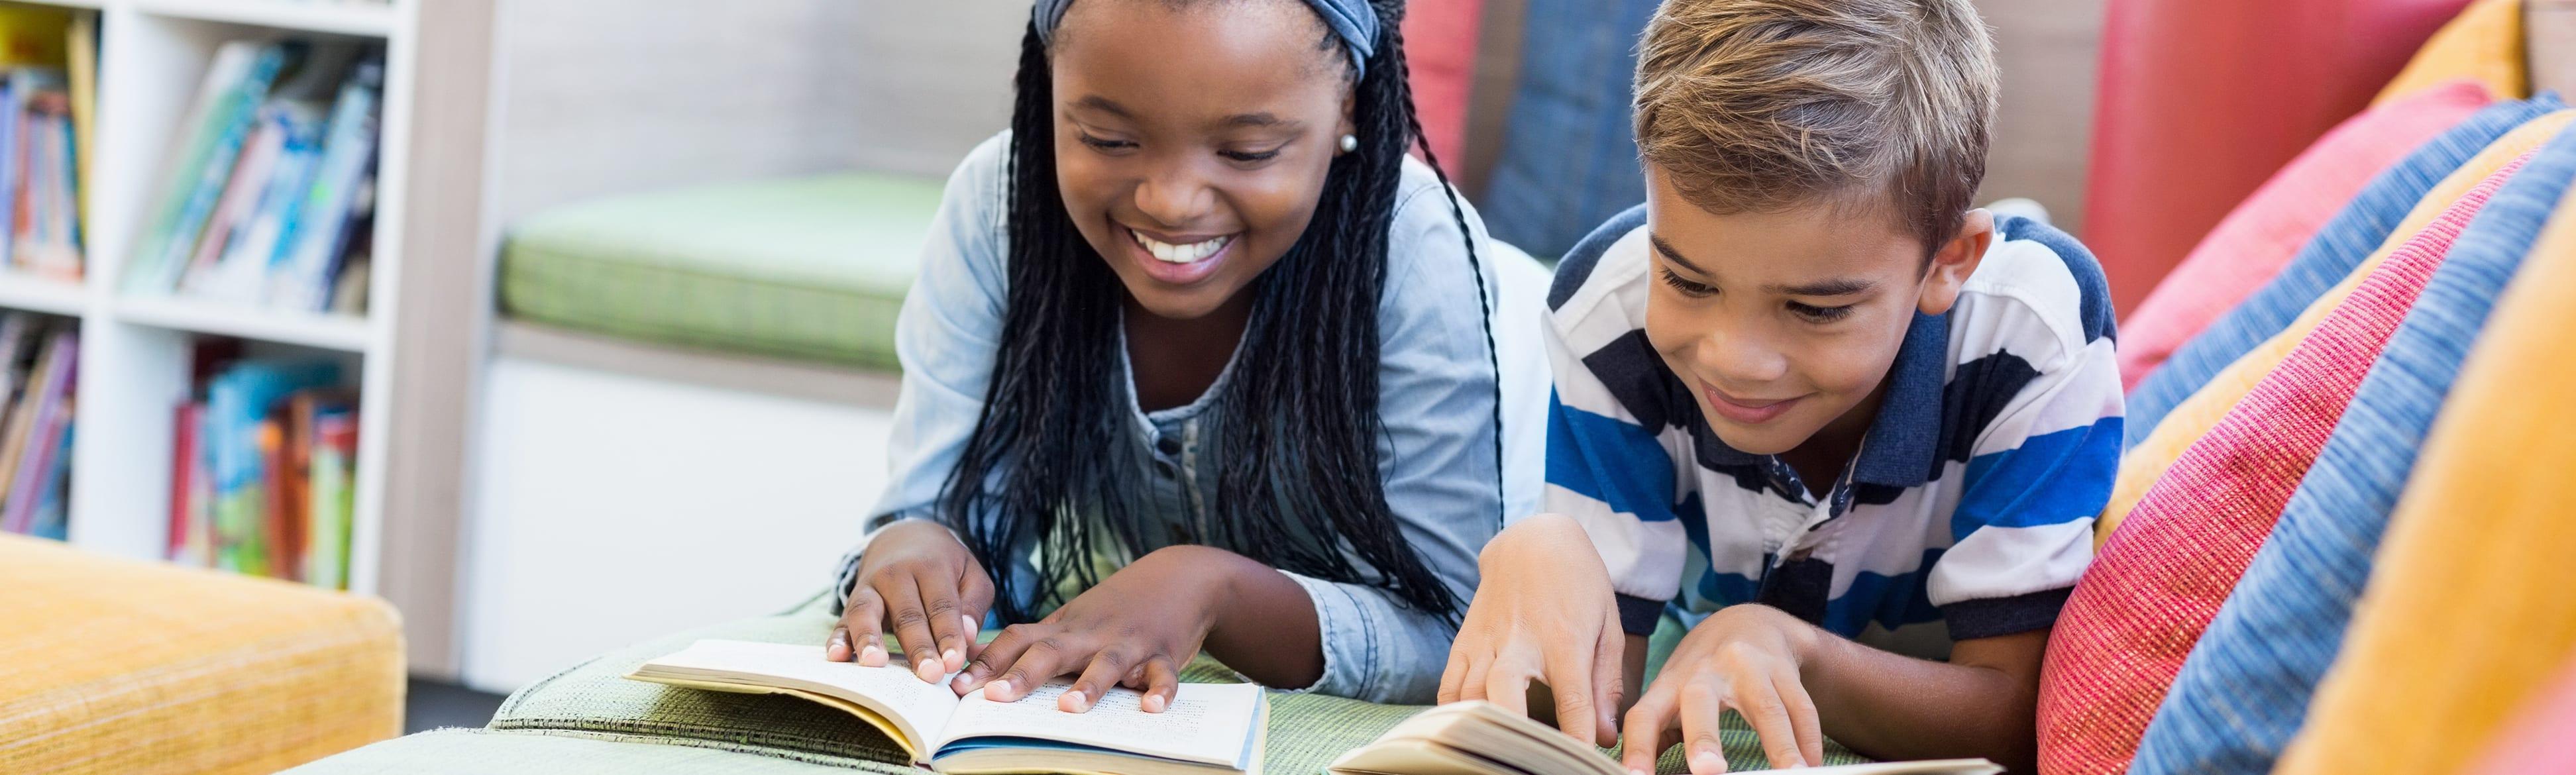 Children reading the book in summer park